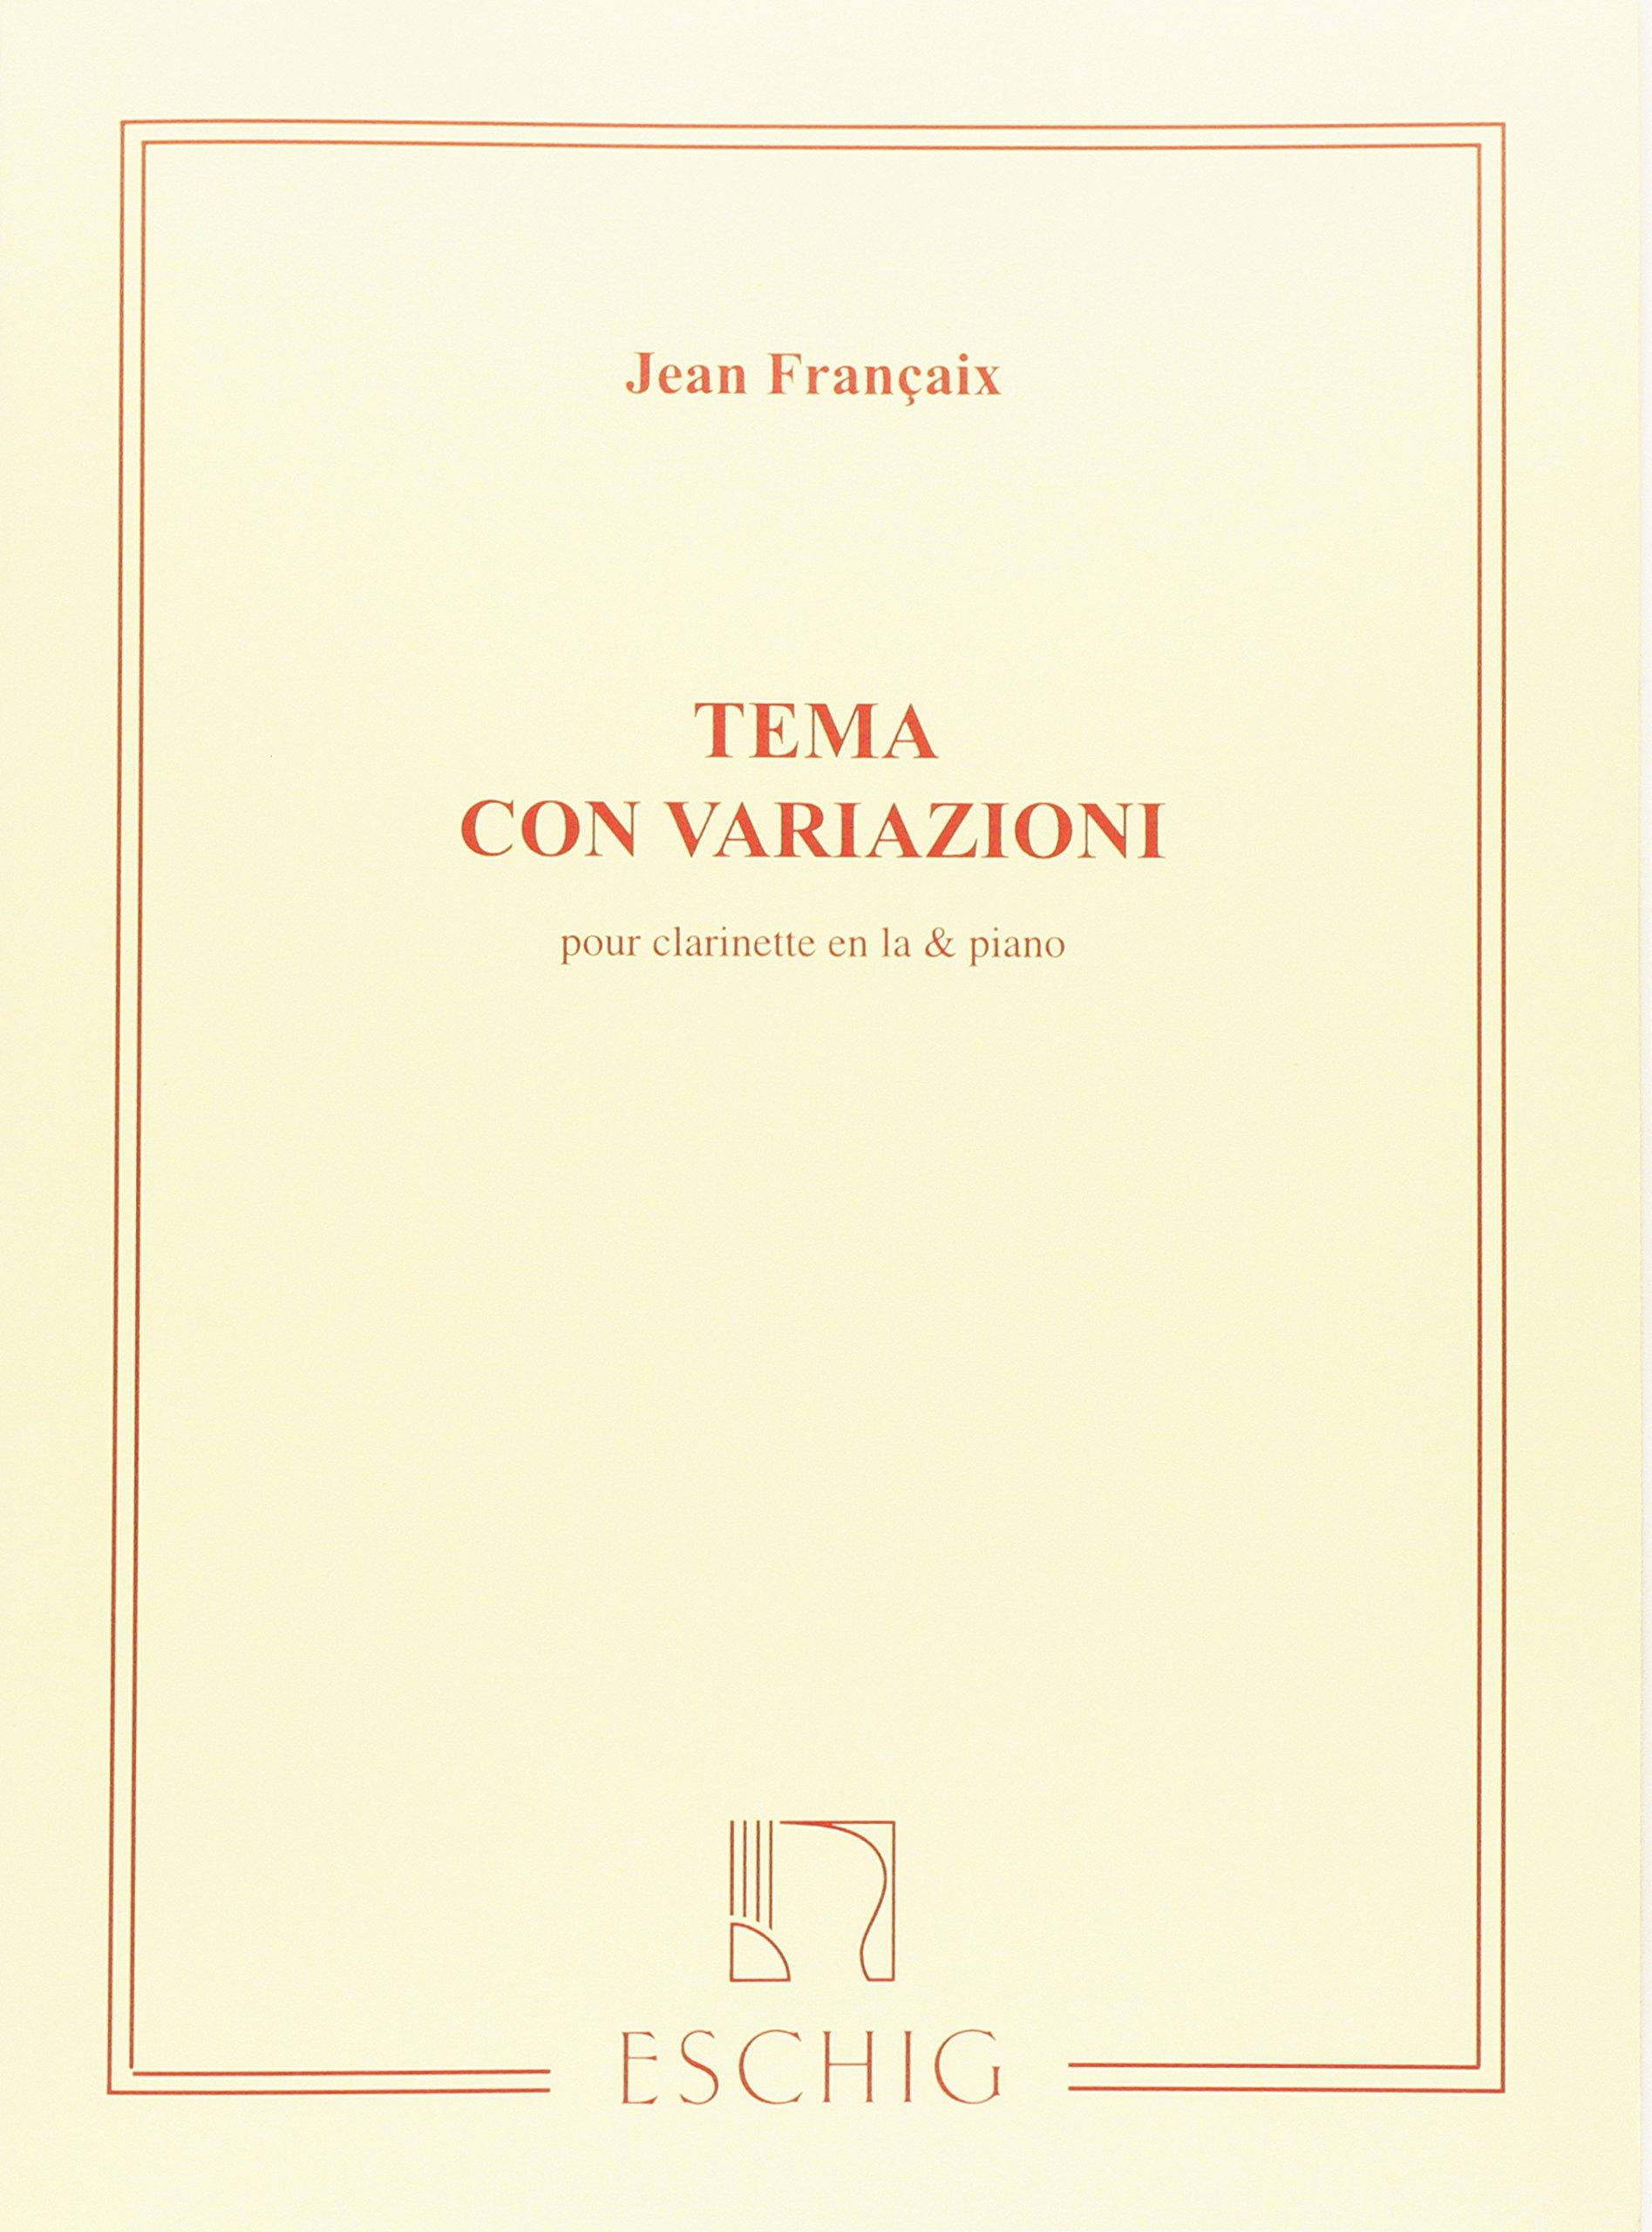 Tema Con Variazioni pour clarinette en La et Piano (Tedesco) Spartito musicale – 1 gen 2001 J. Francaix Max Eschig 0045034990 ME8141